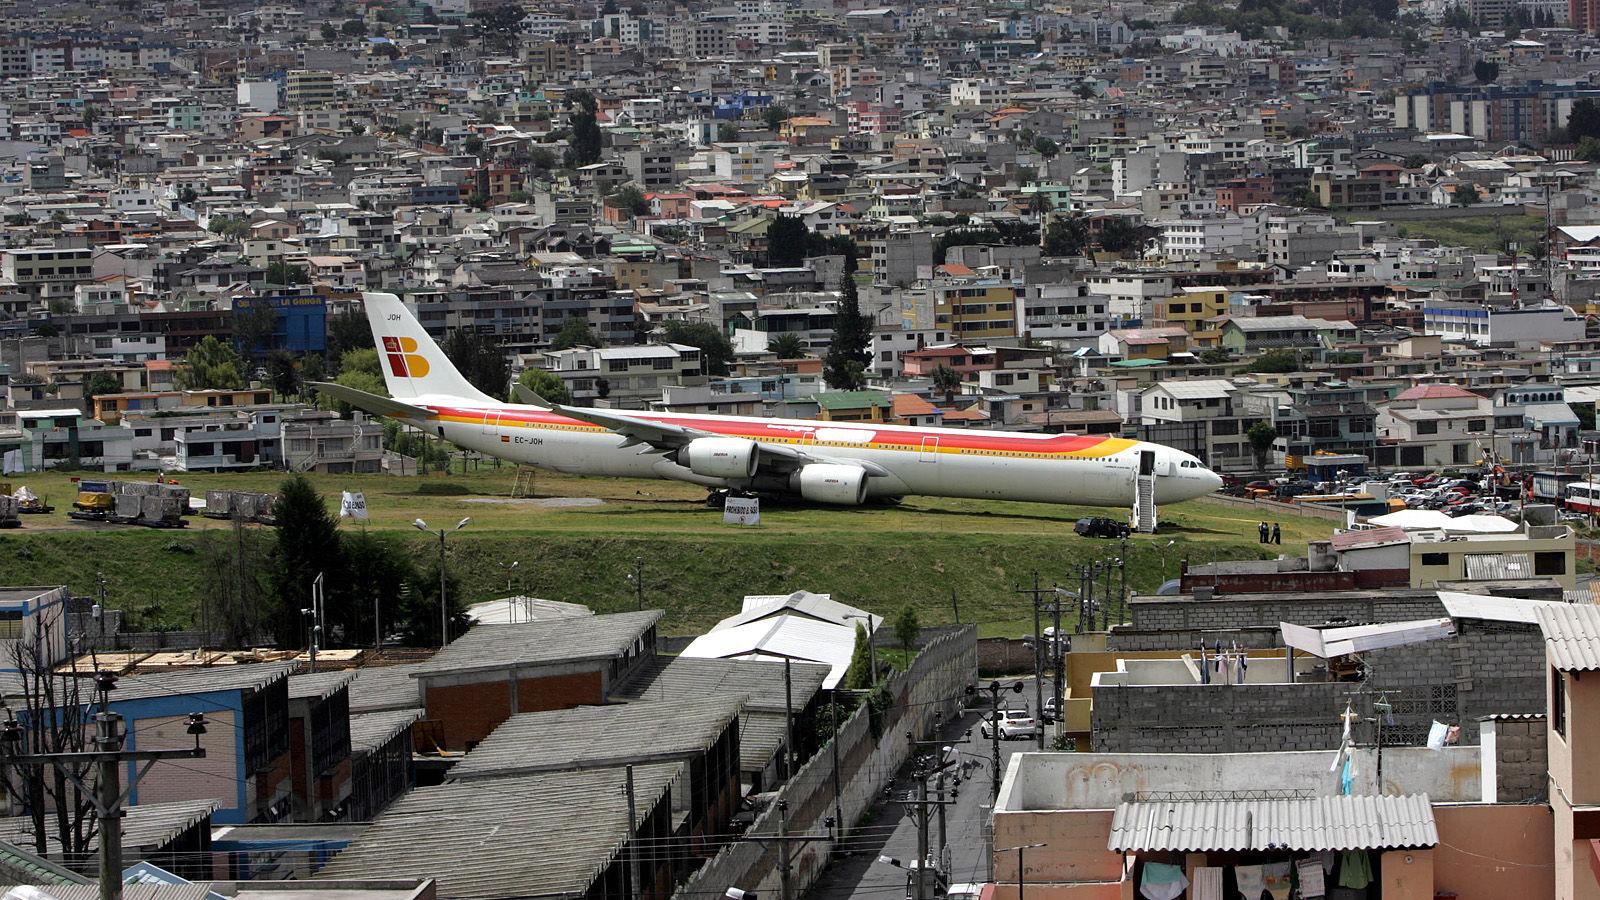 24. Congonhas Airport, Brazil